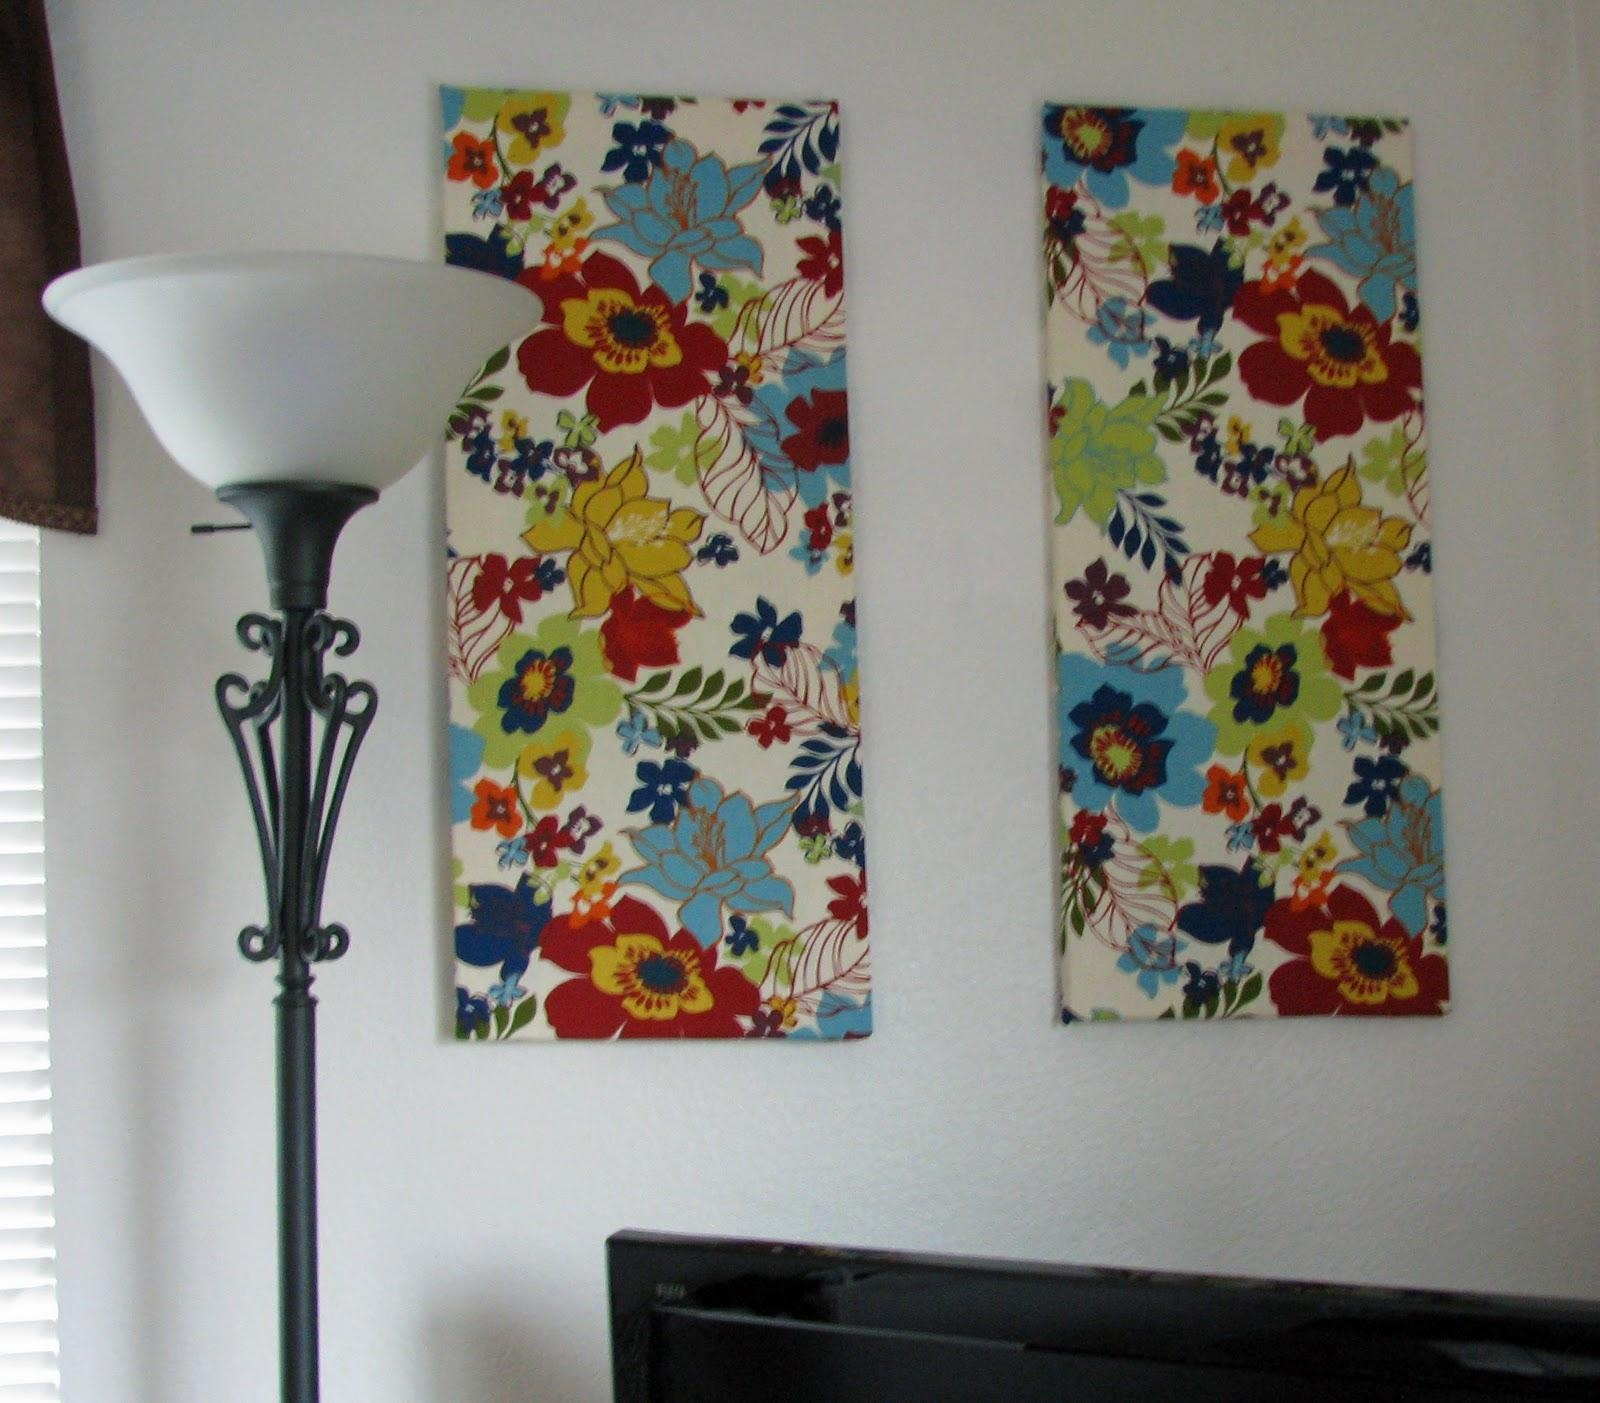 The Closet Domestic: Hiding White Walls: Fabric Wall Art Regarding Fabric Wall Art (View 16 of 20)